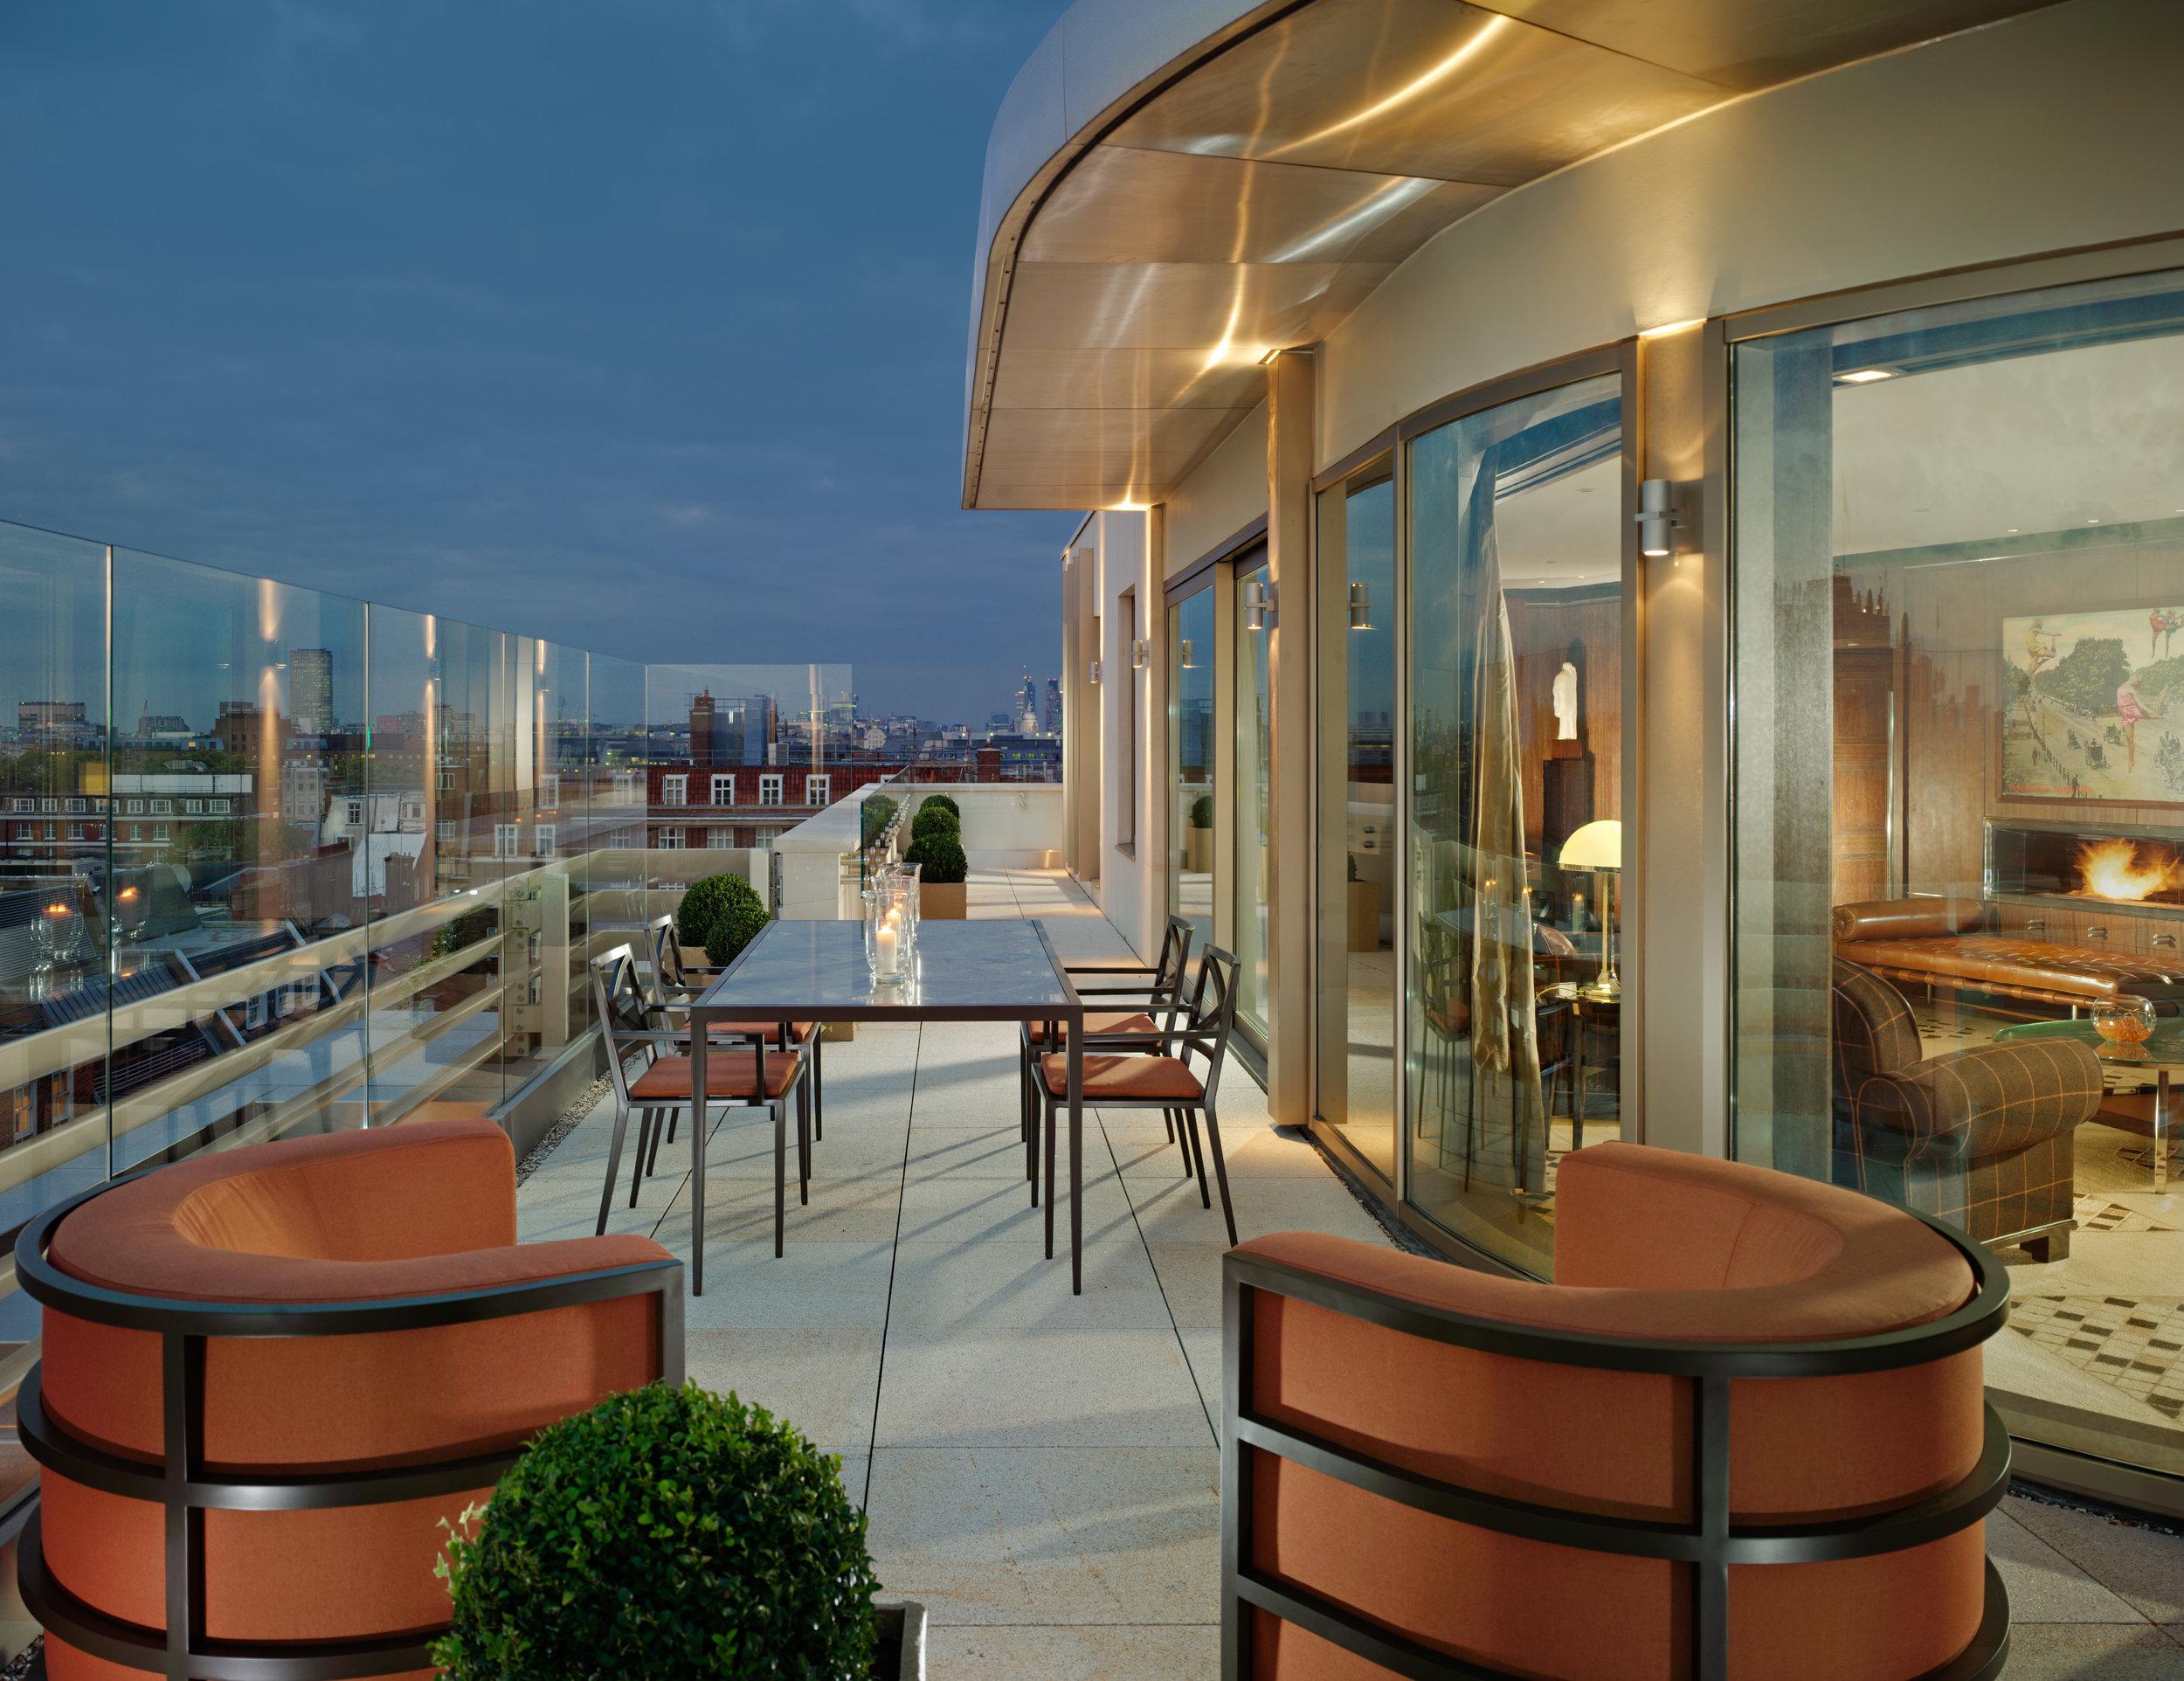 Penthouse Terrace - 45 Park Lane evening view.jpg